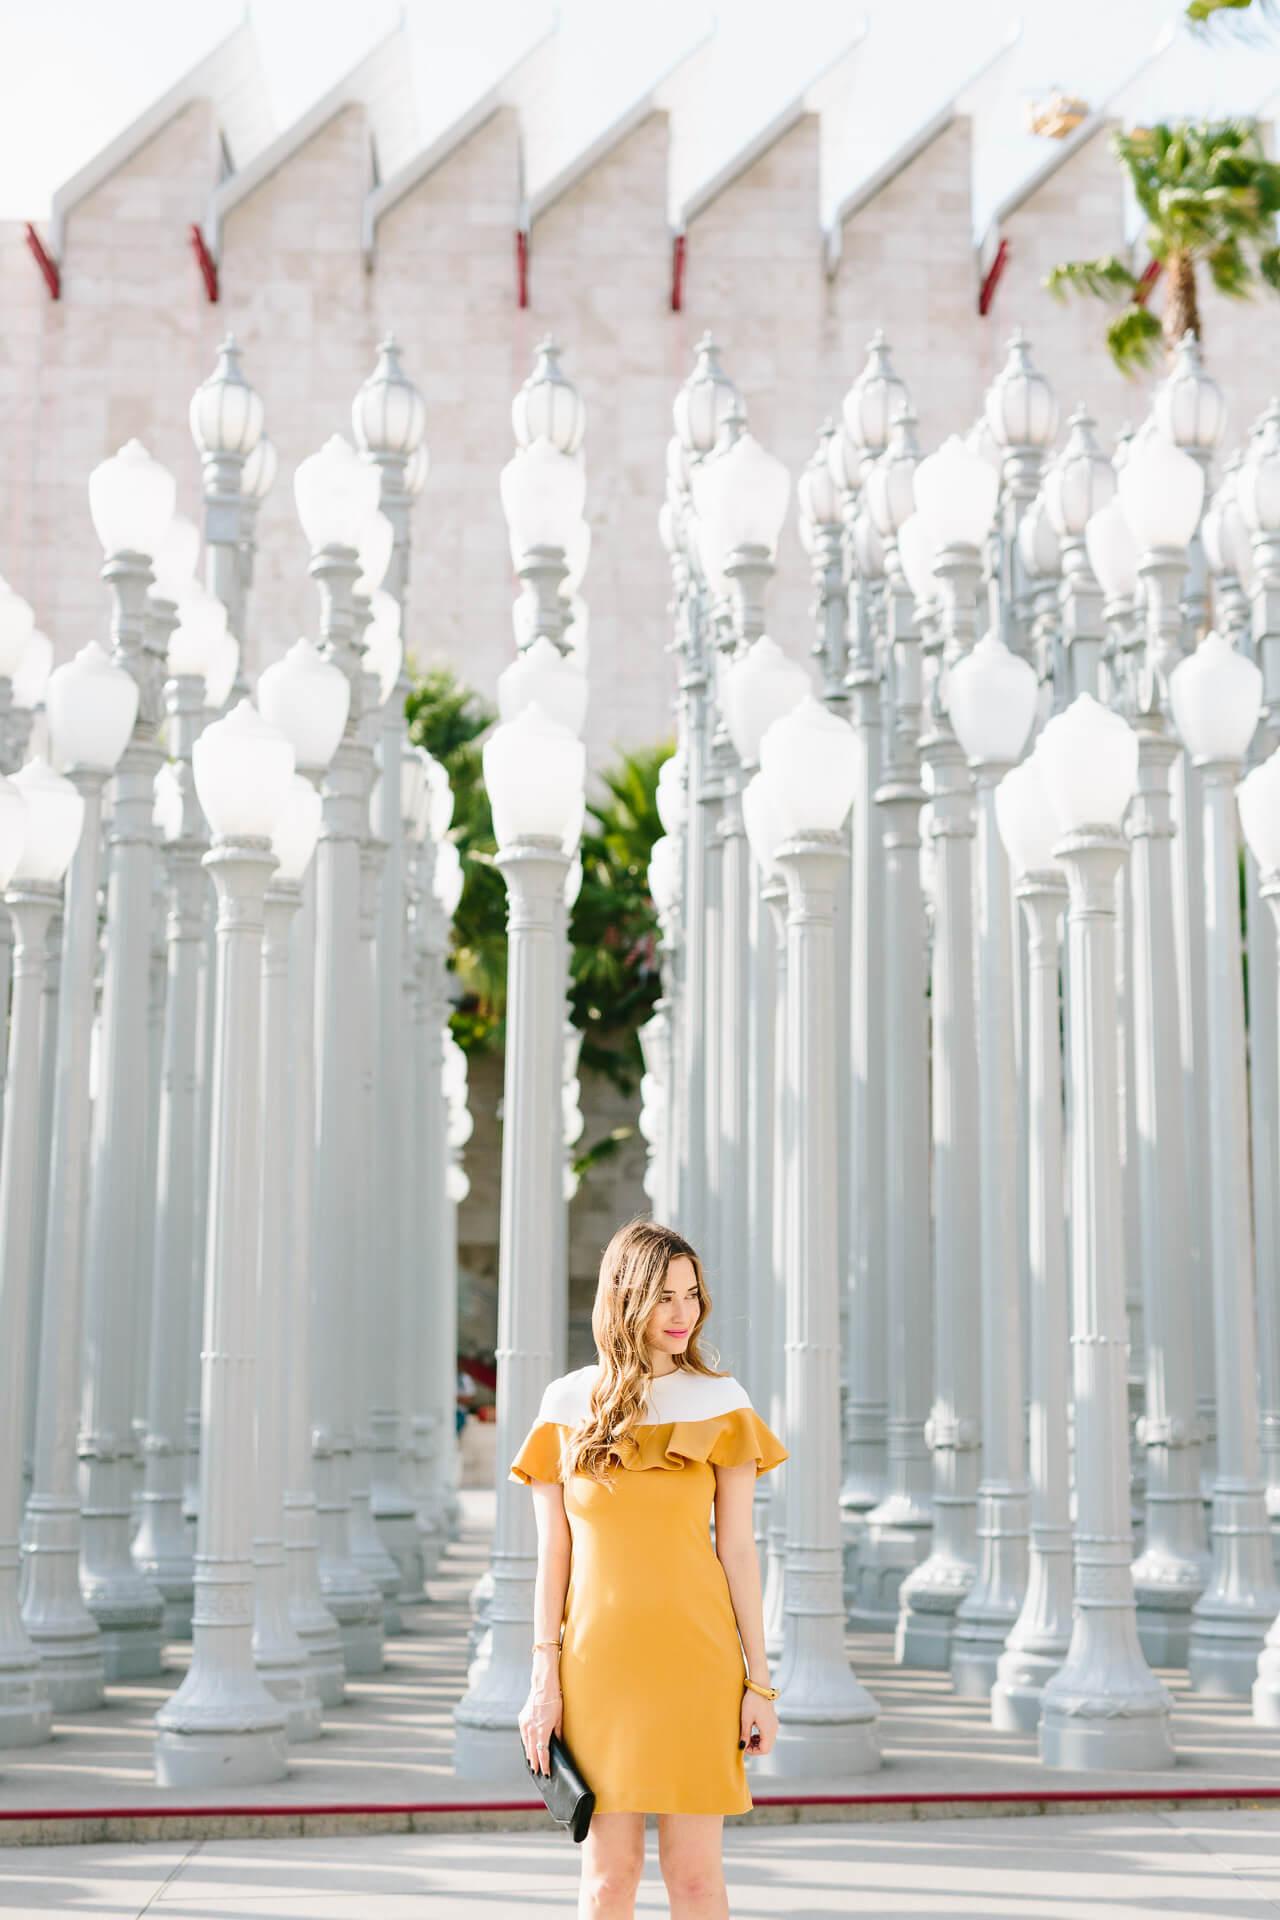 Los Angeles Blogger at LACMA Urban Lights Exhibit